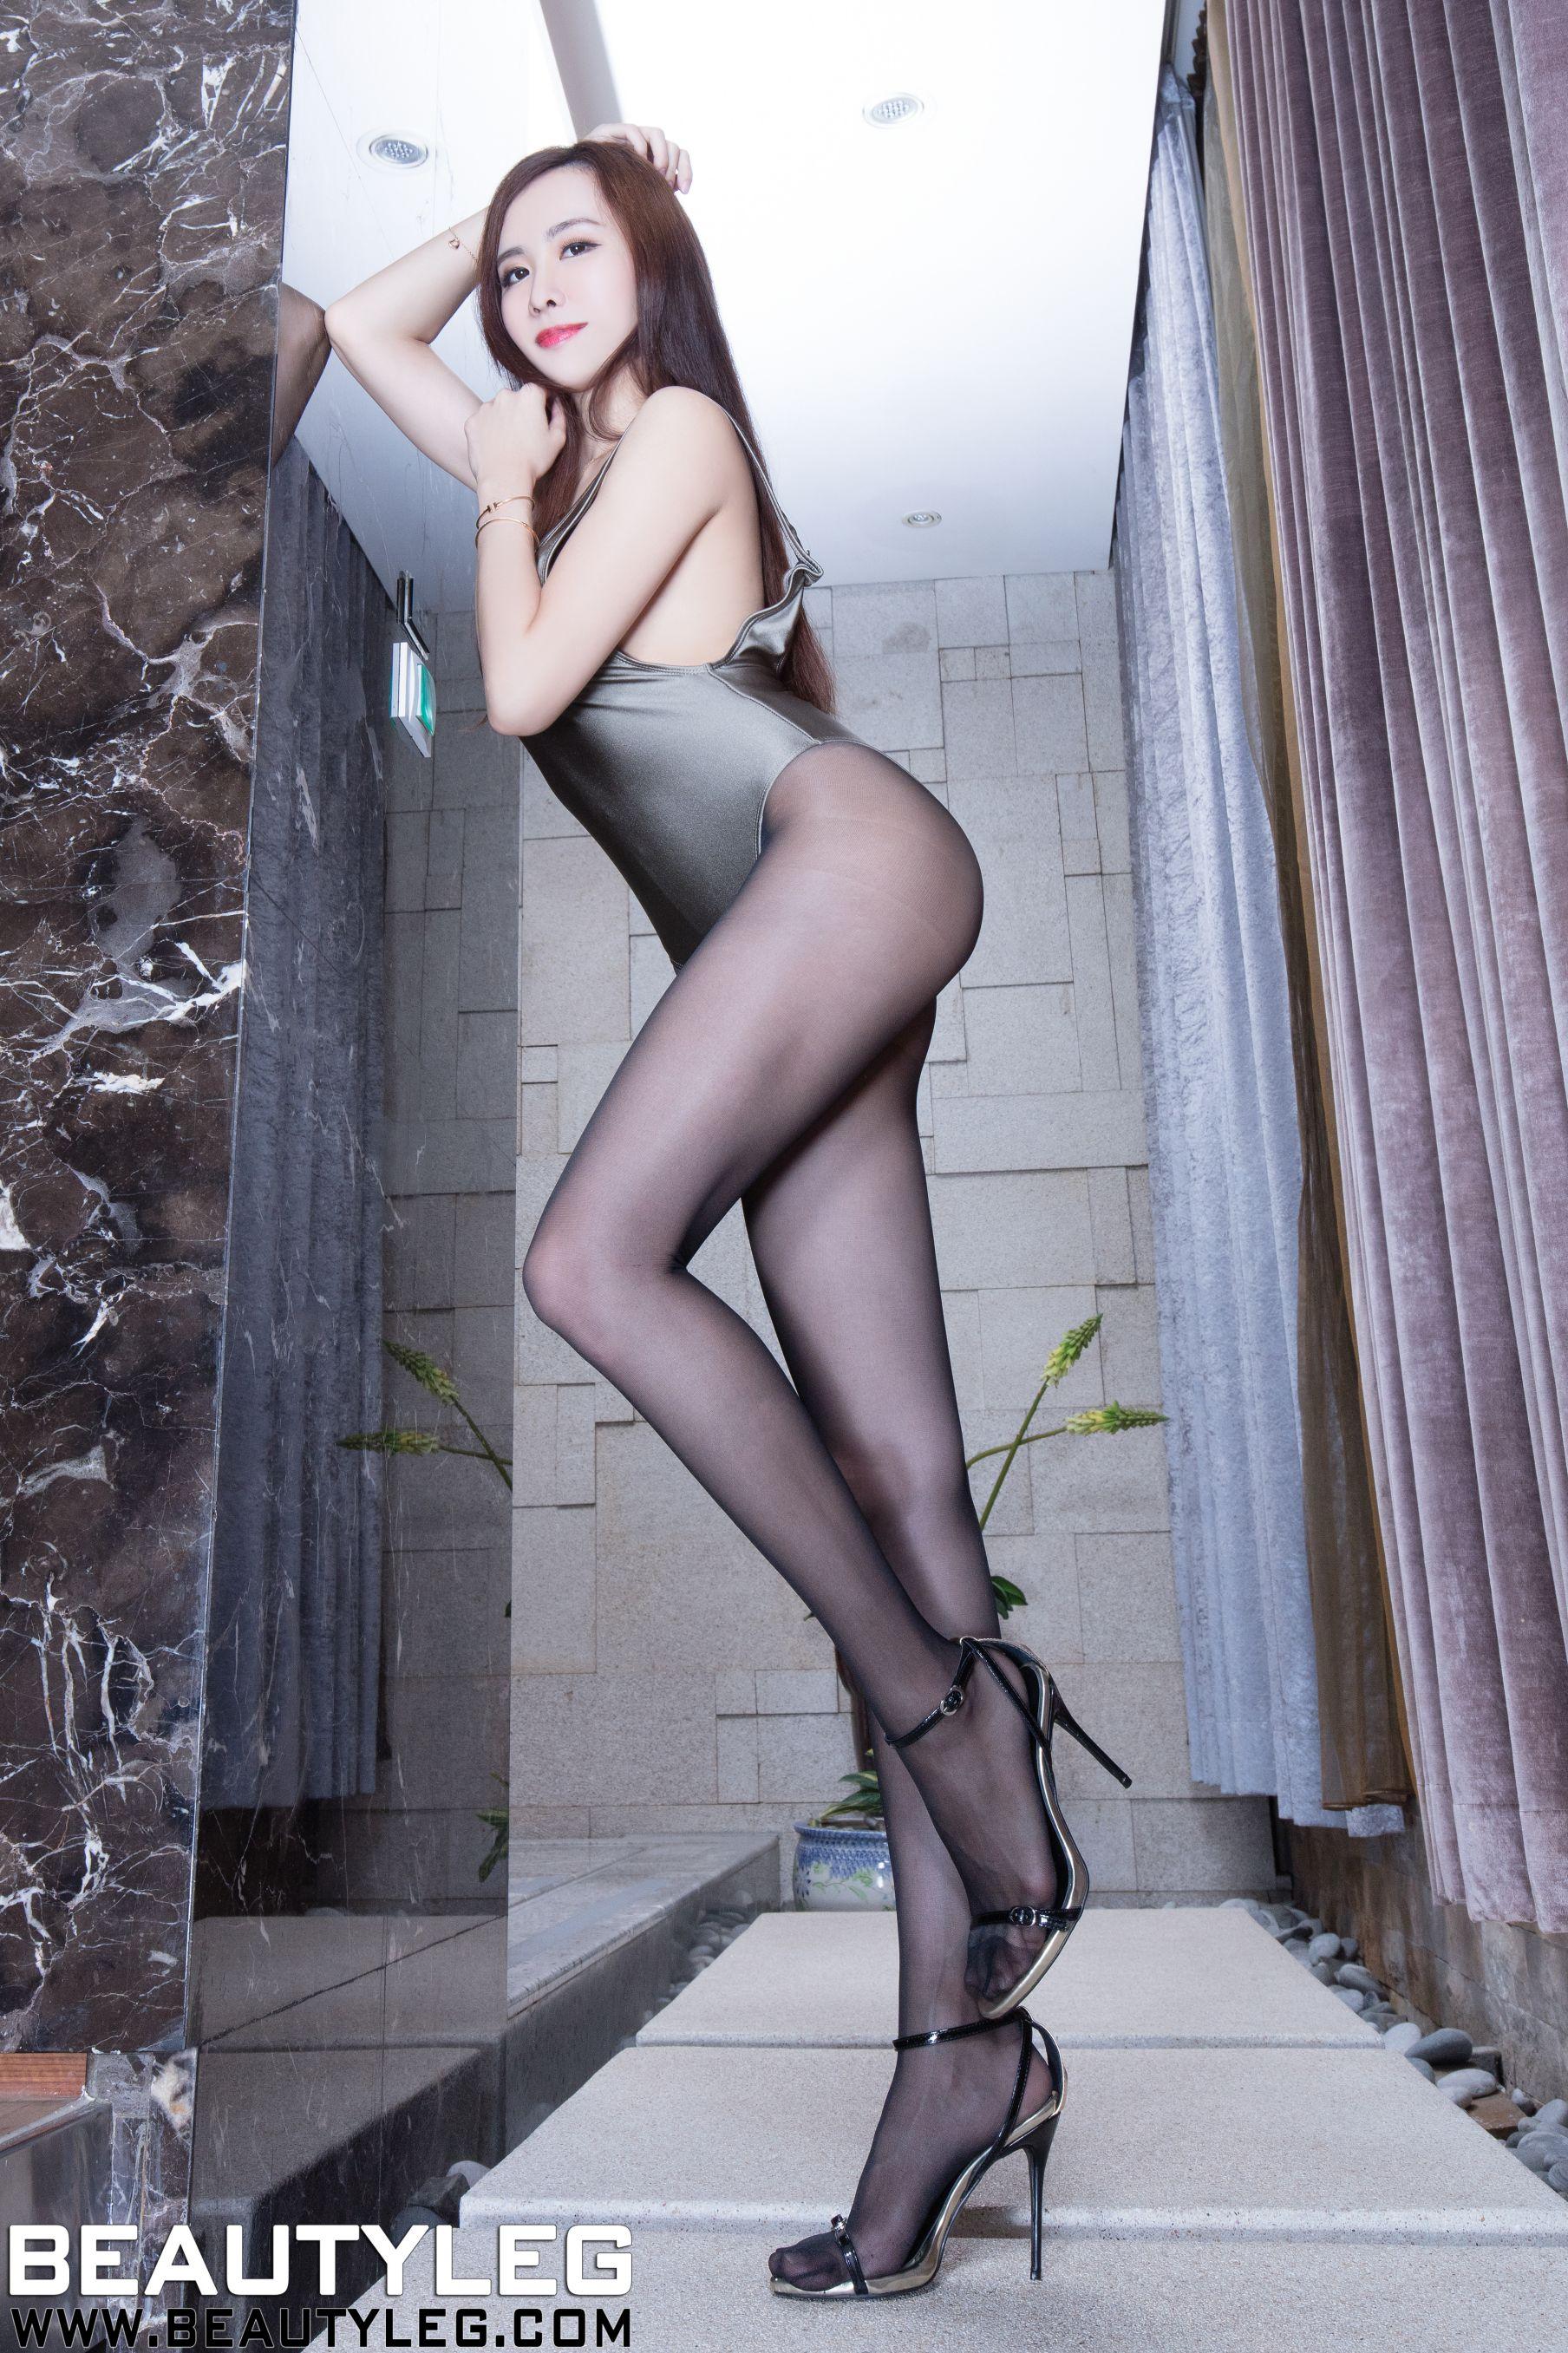 VOL.1366 [Beautyleg]丝袜美腿黑丝长腿美女:曾妍希(腿模Dora)高品质写真套图(56P)